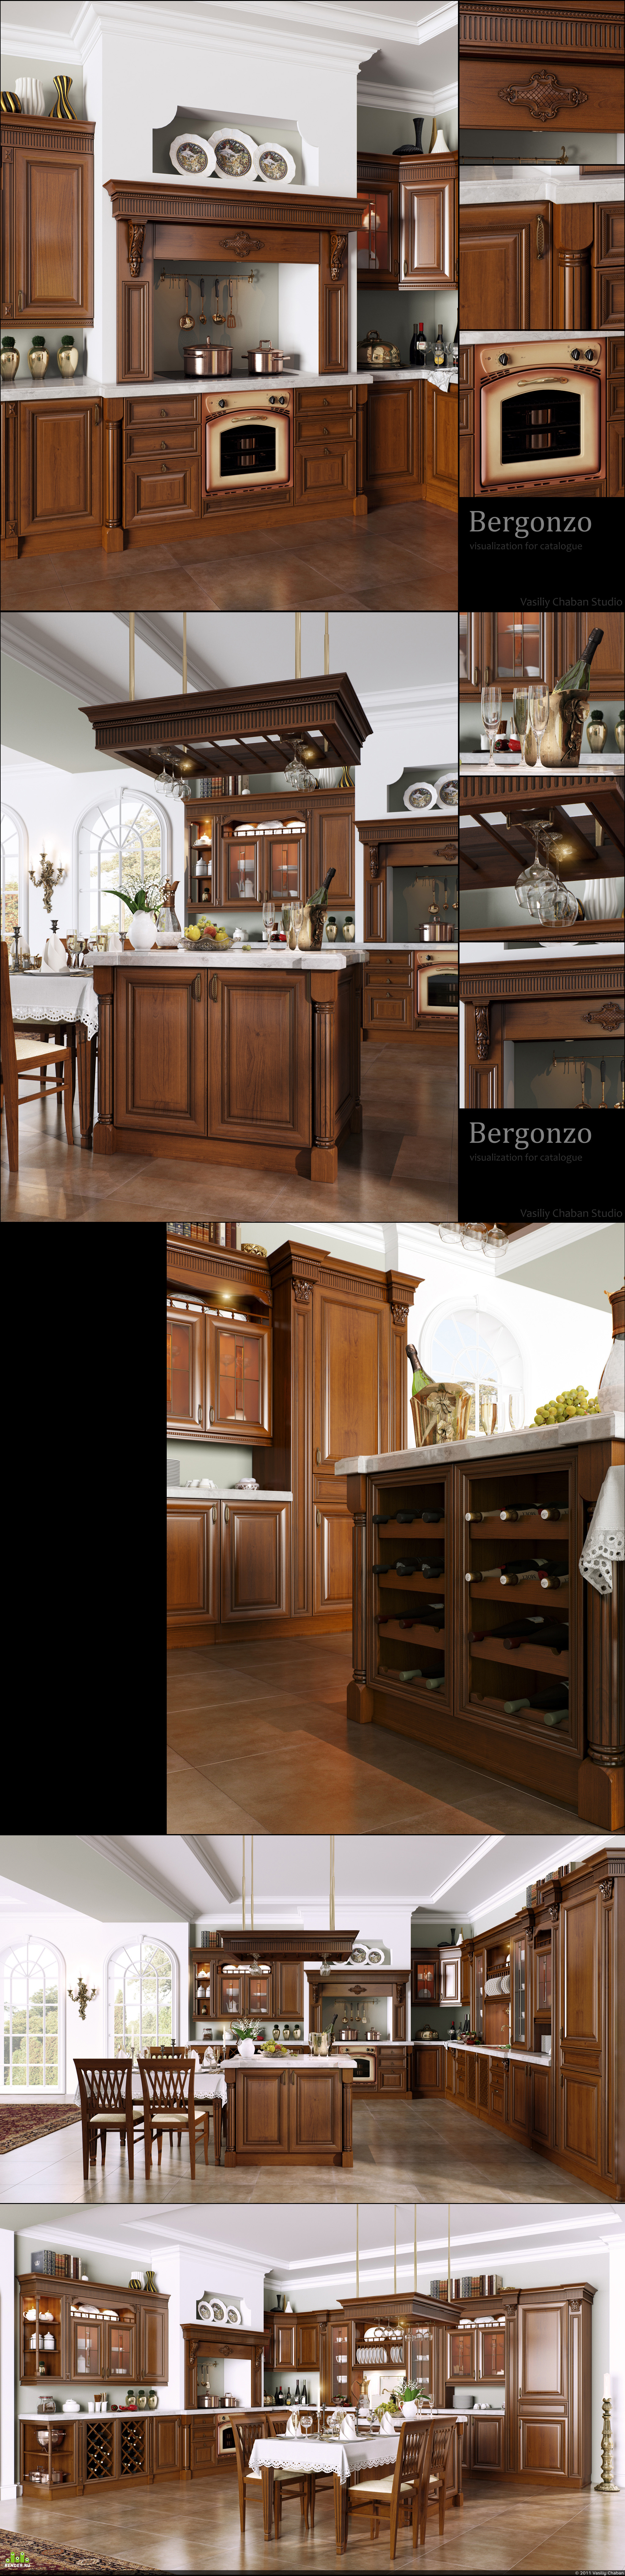 preview Bergonzo